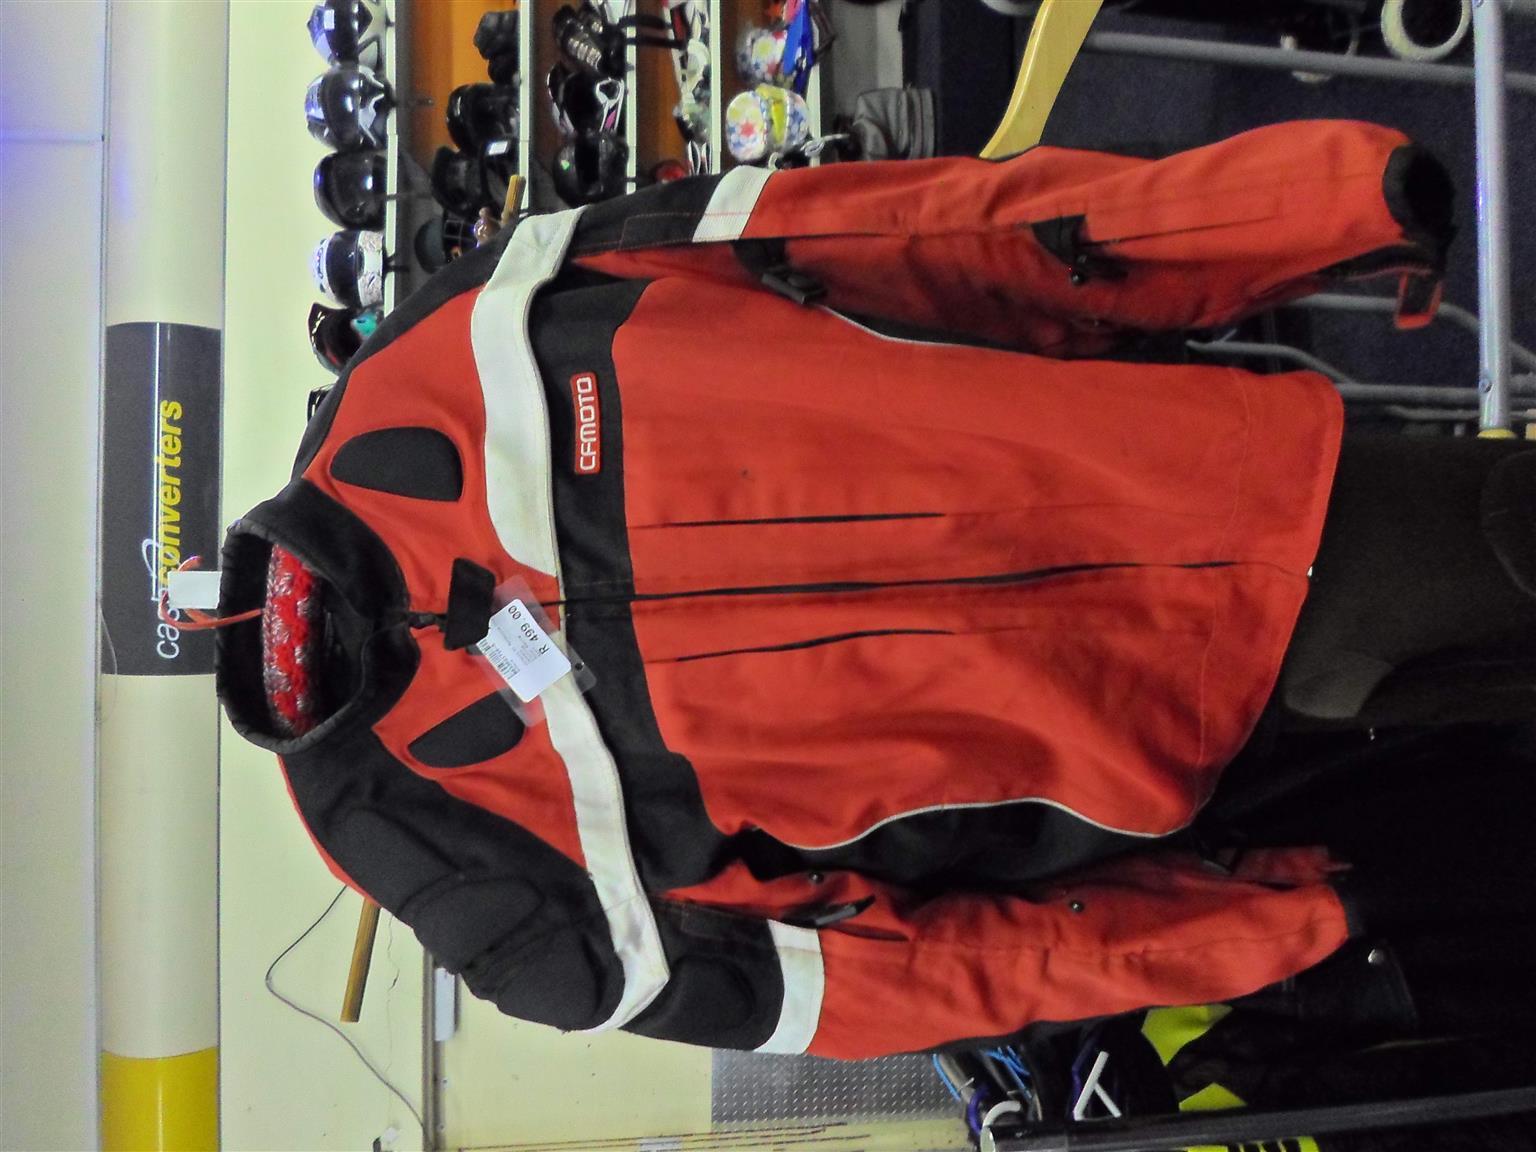 XL Cfmoto Motorcycle Jacket